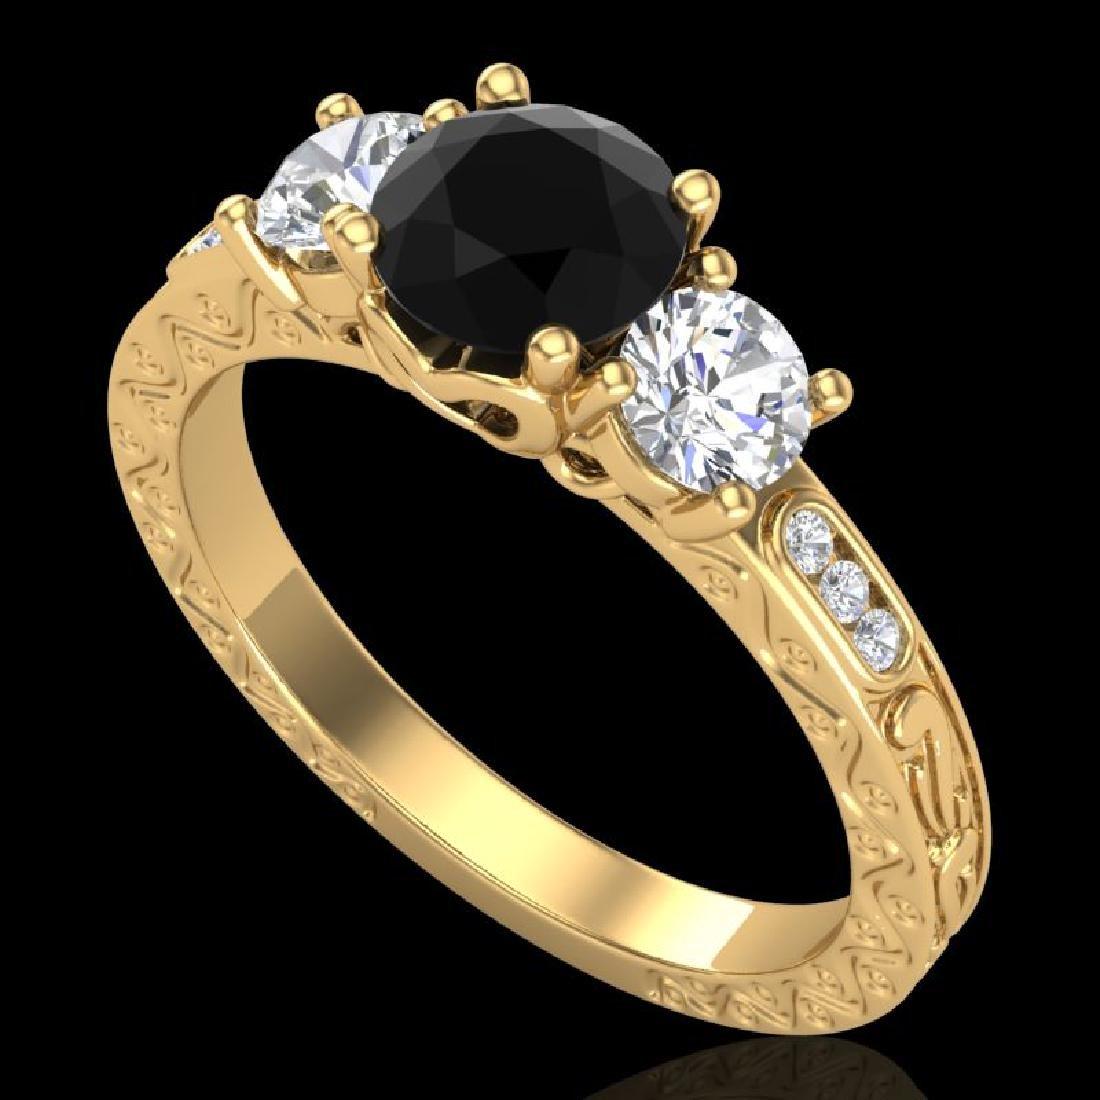 1.41 CTW Fancy Black Diamond Solitaire Art Deco 3 Stone